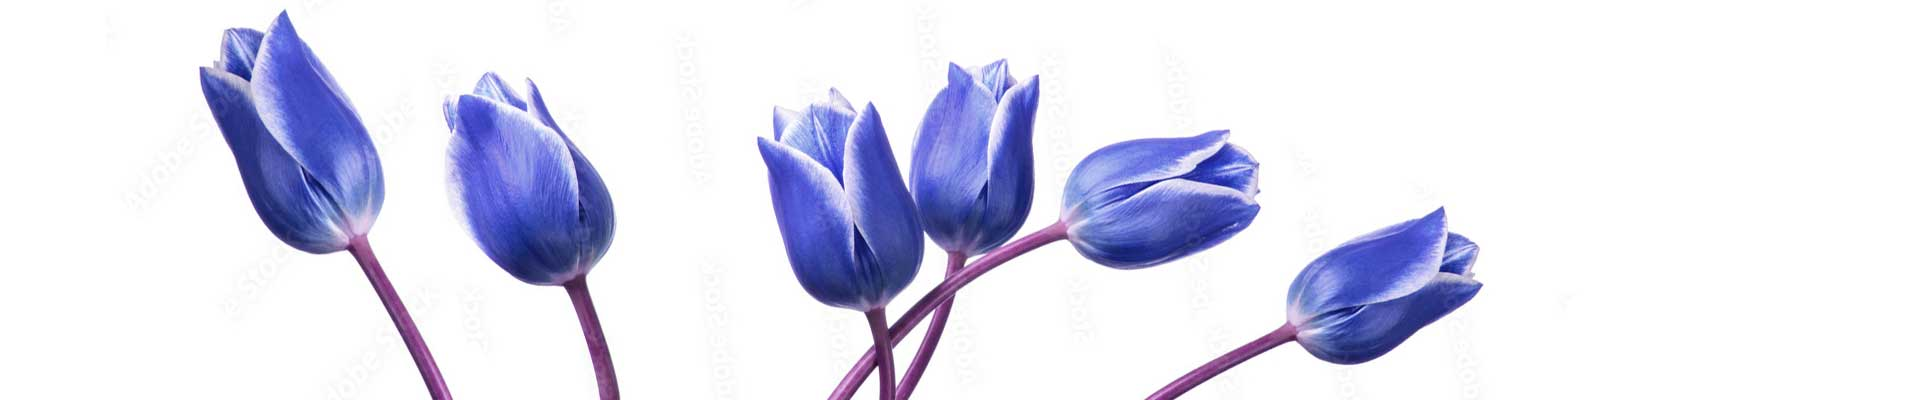 flores de inverno 2021